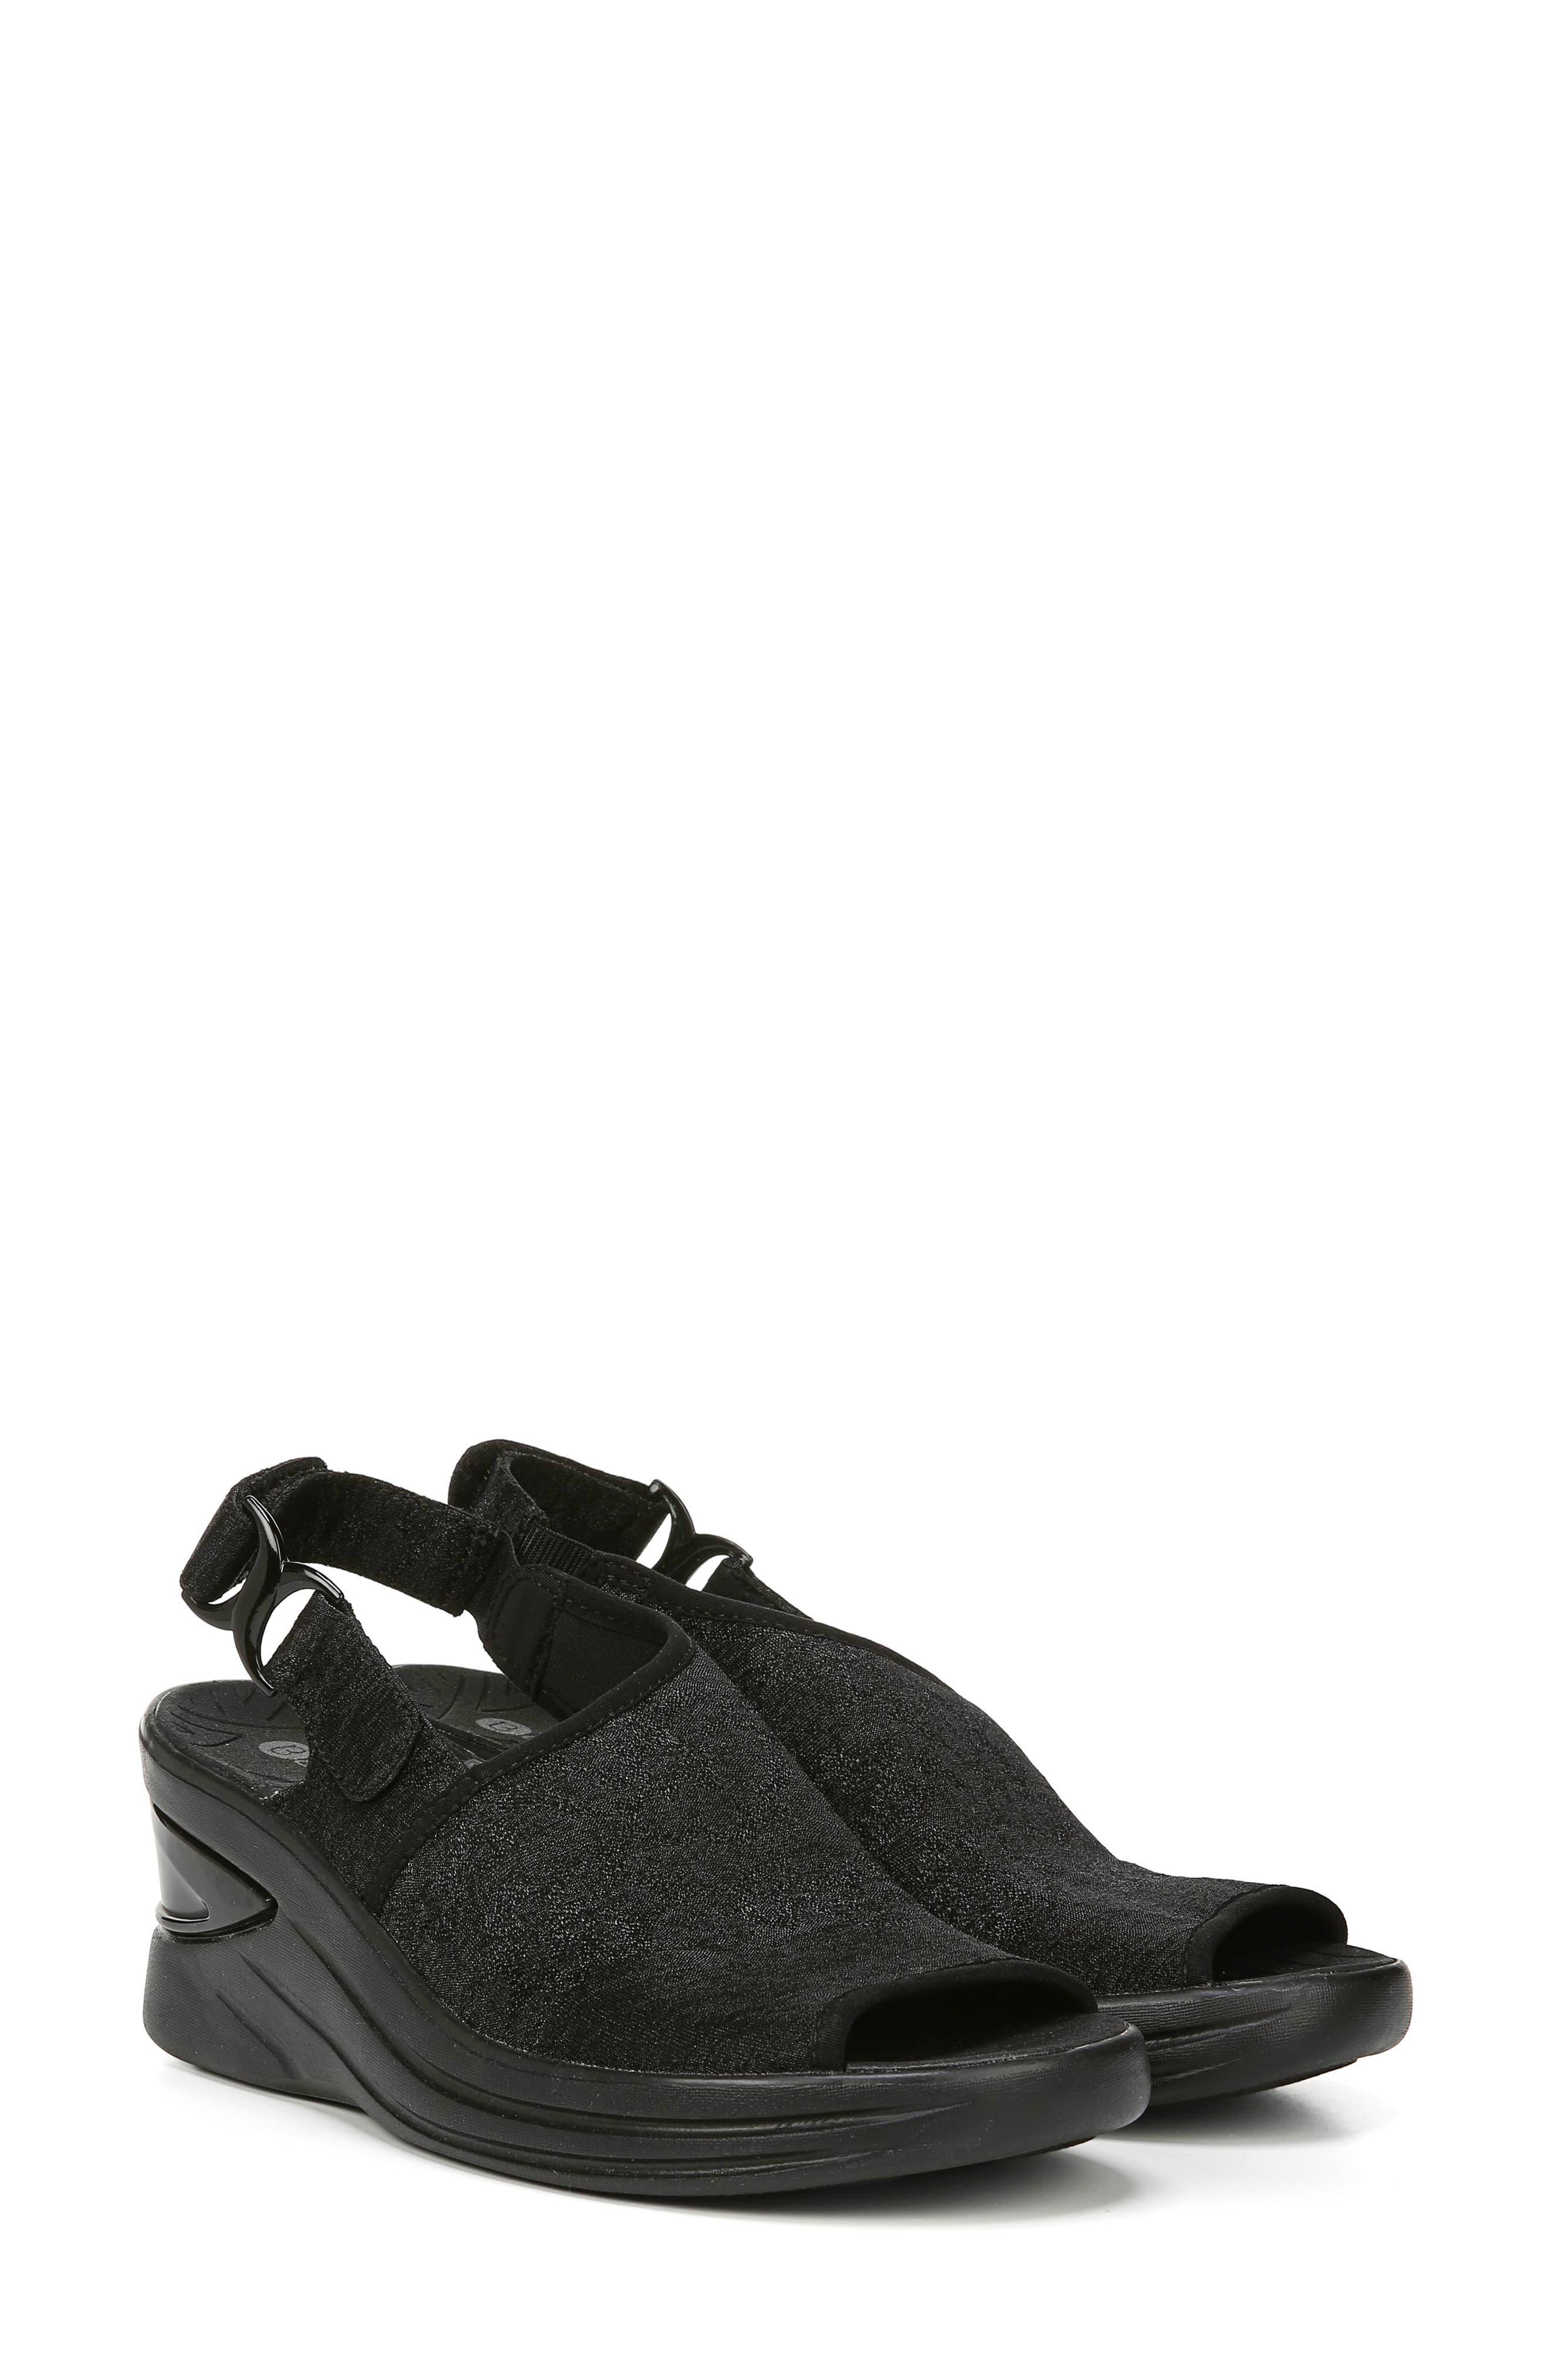 BZEES, Vivia Slingback Wedge Sandal, Alternate thumbnail 8, color, BLACK FABRIC